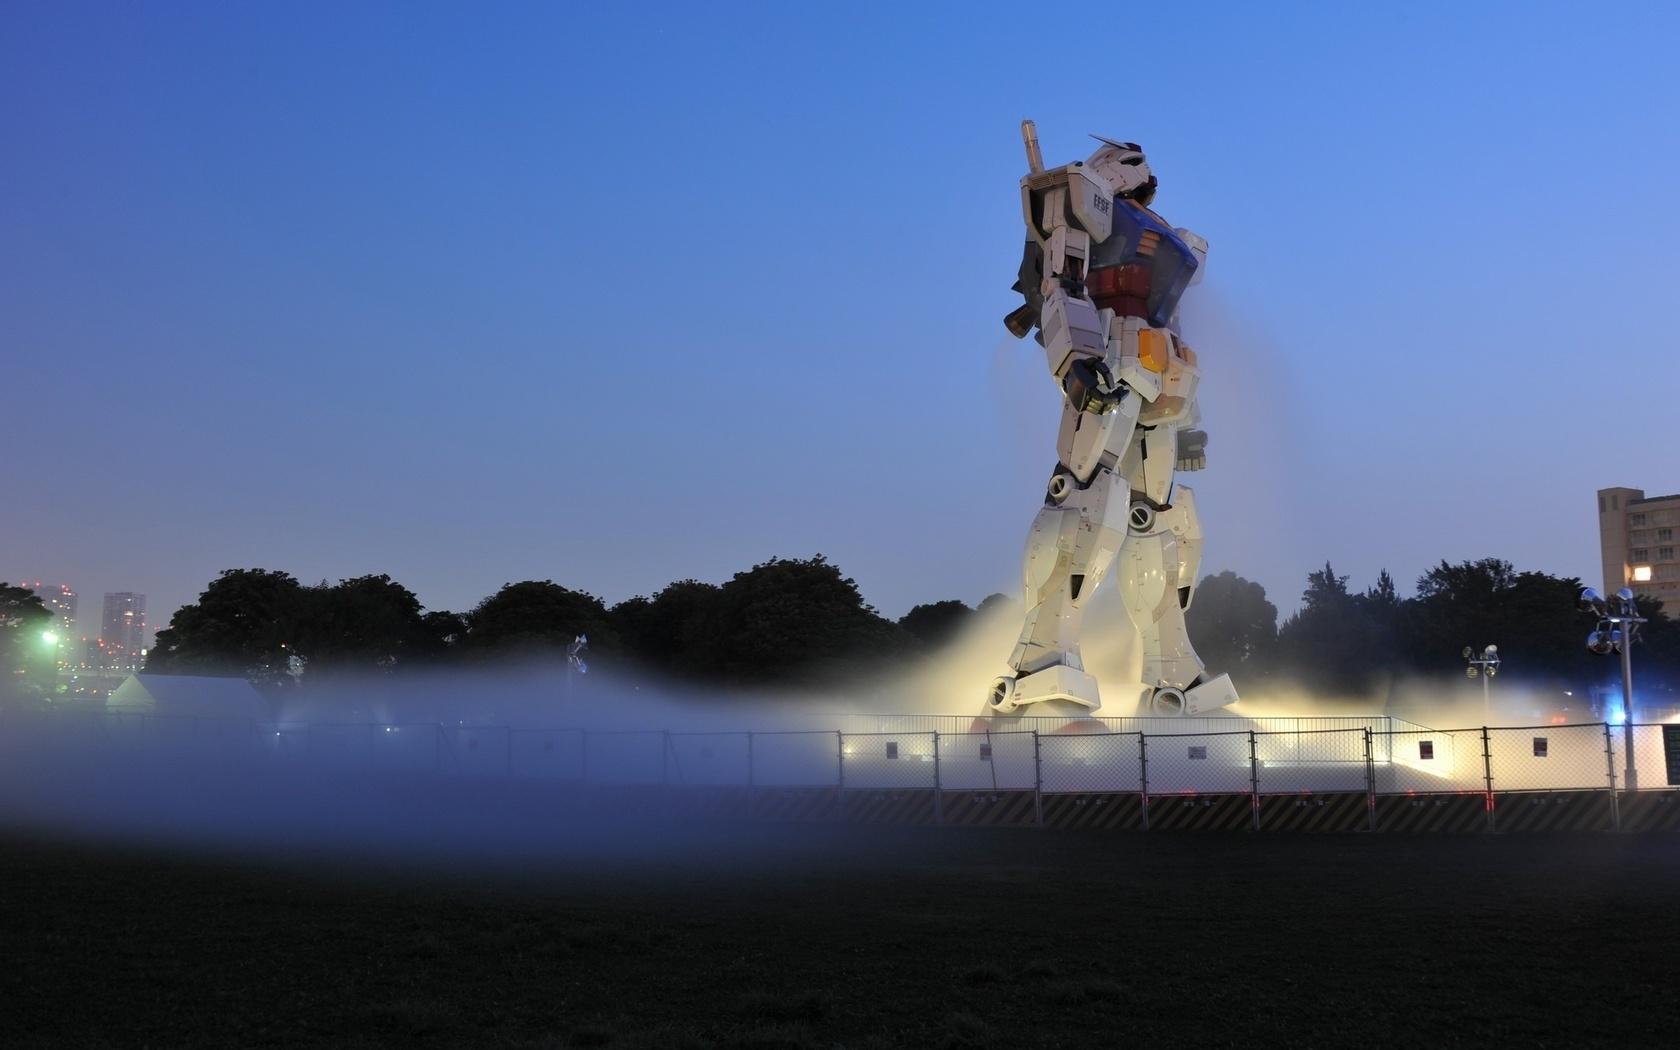 робот, технологии, туман